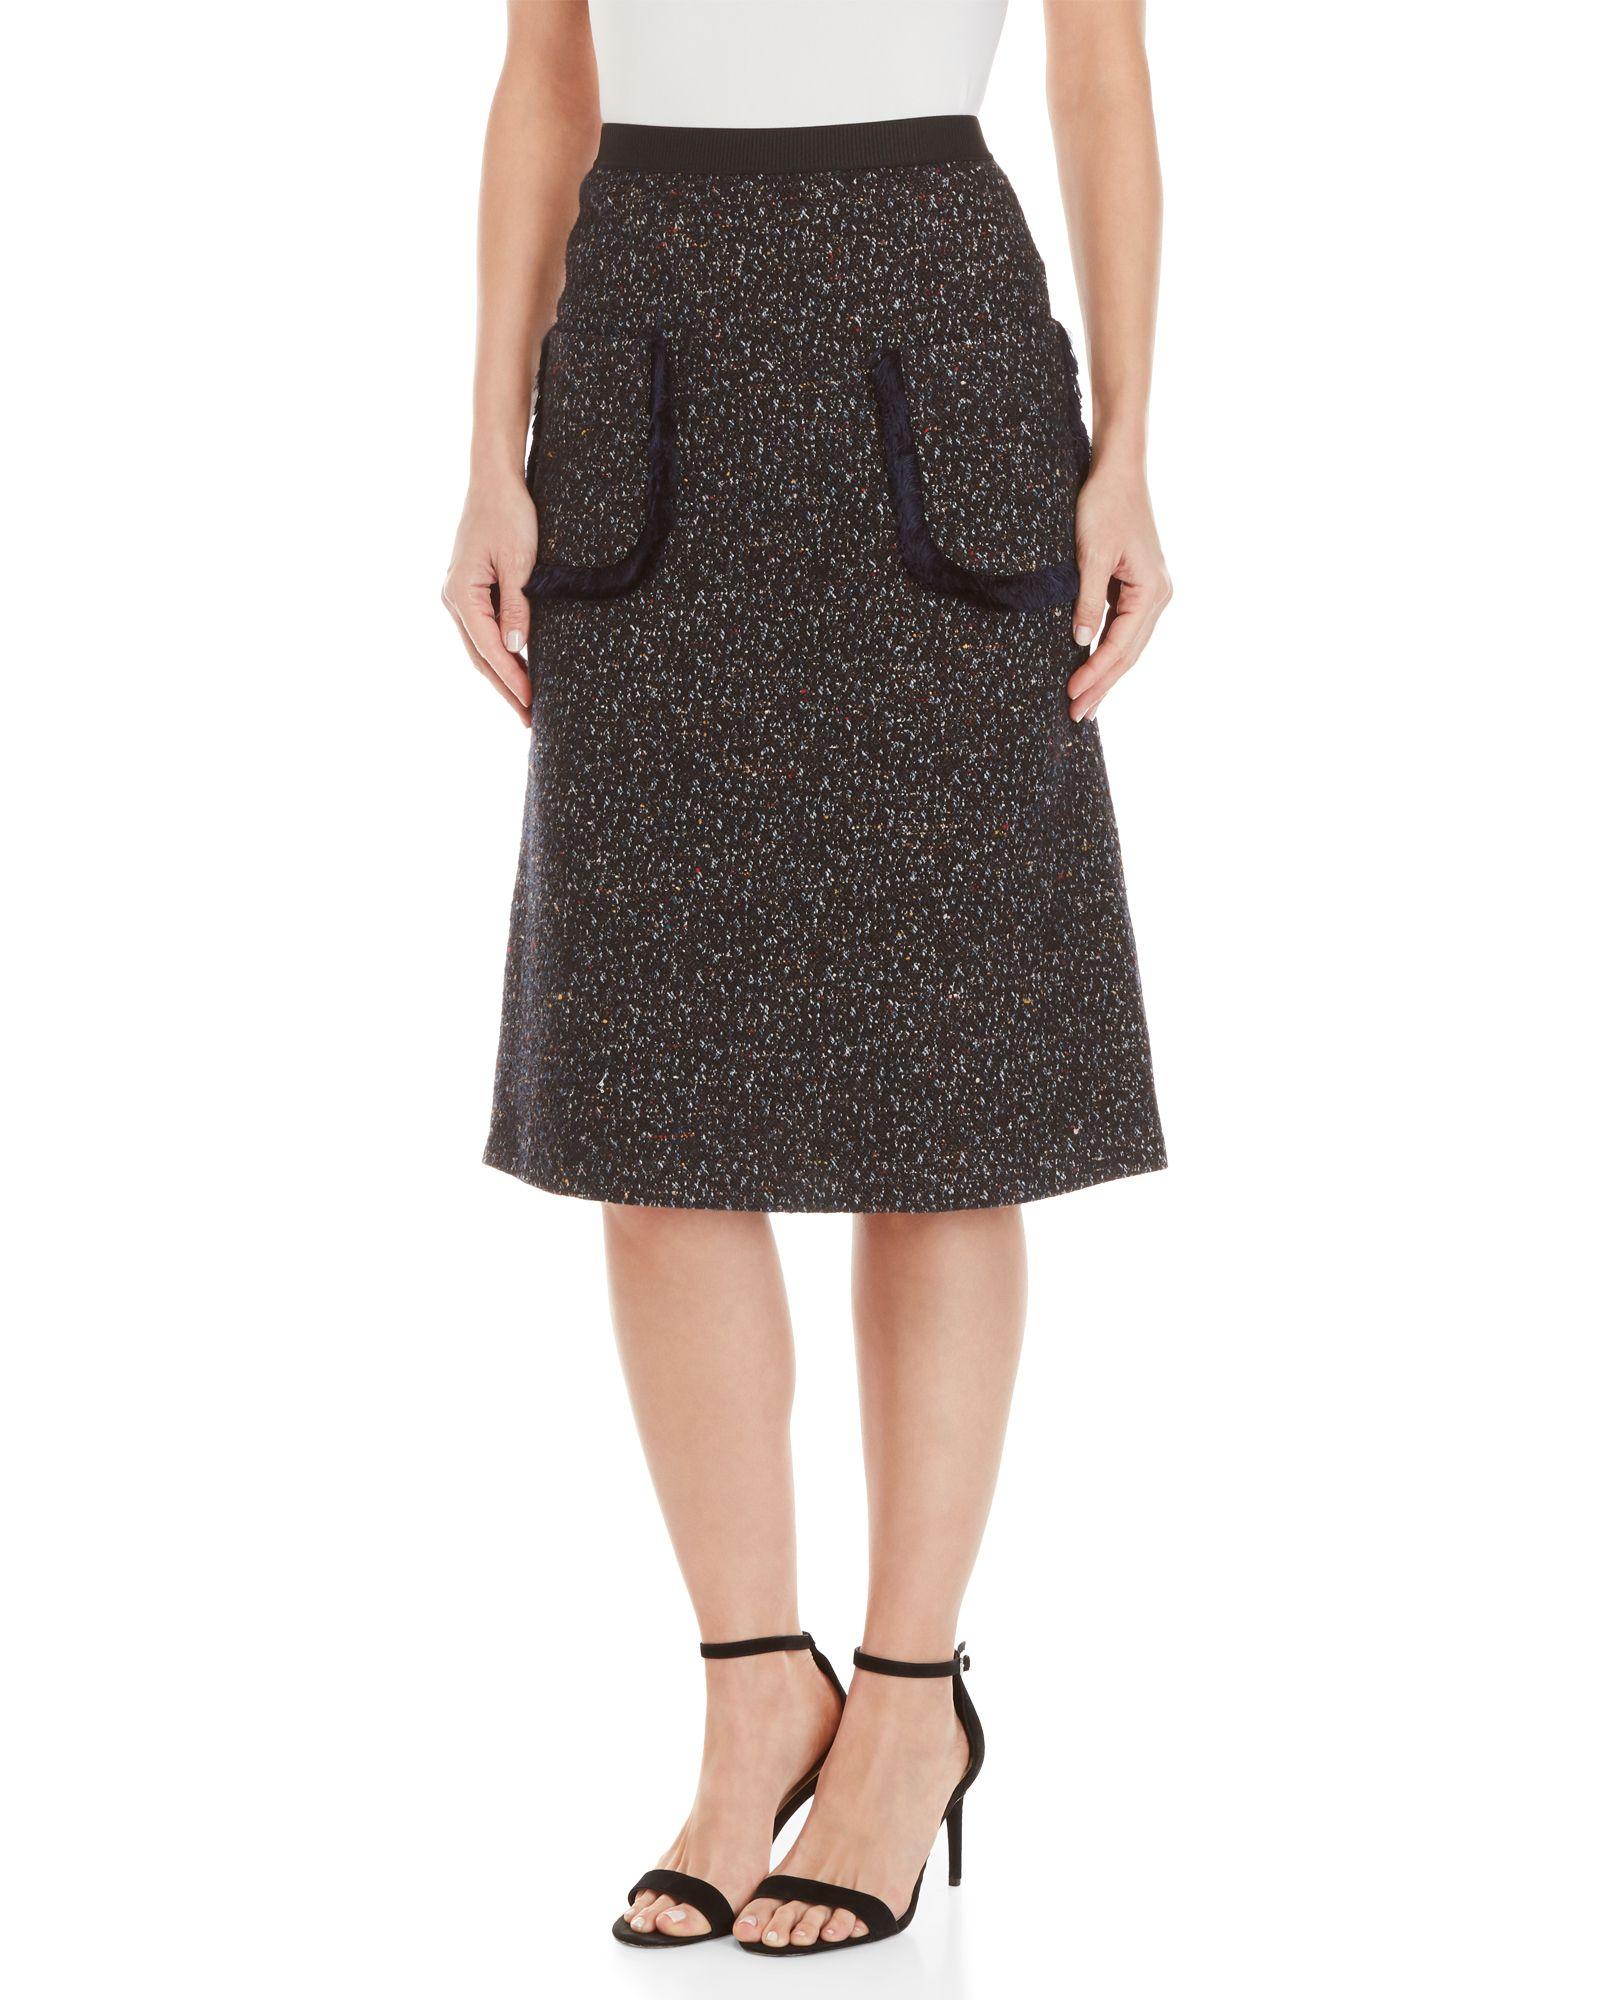 47c9092cad0 Cm.100 Fringe Pocket Tweed A-Line Midi Skirt